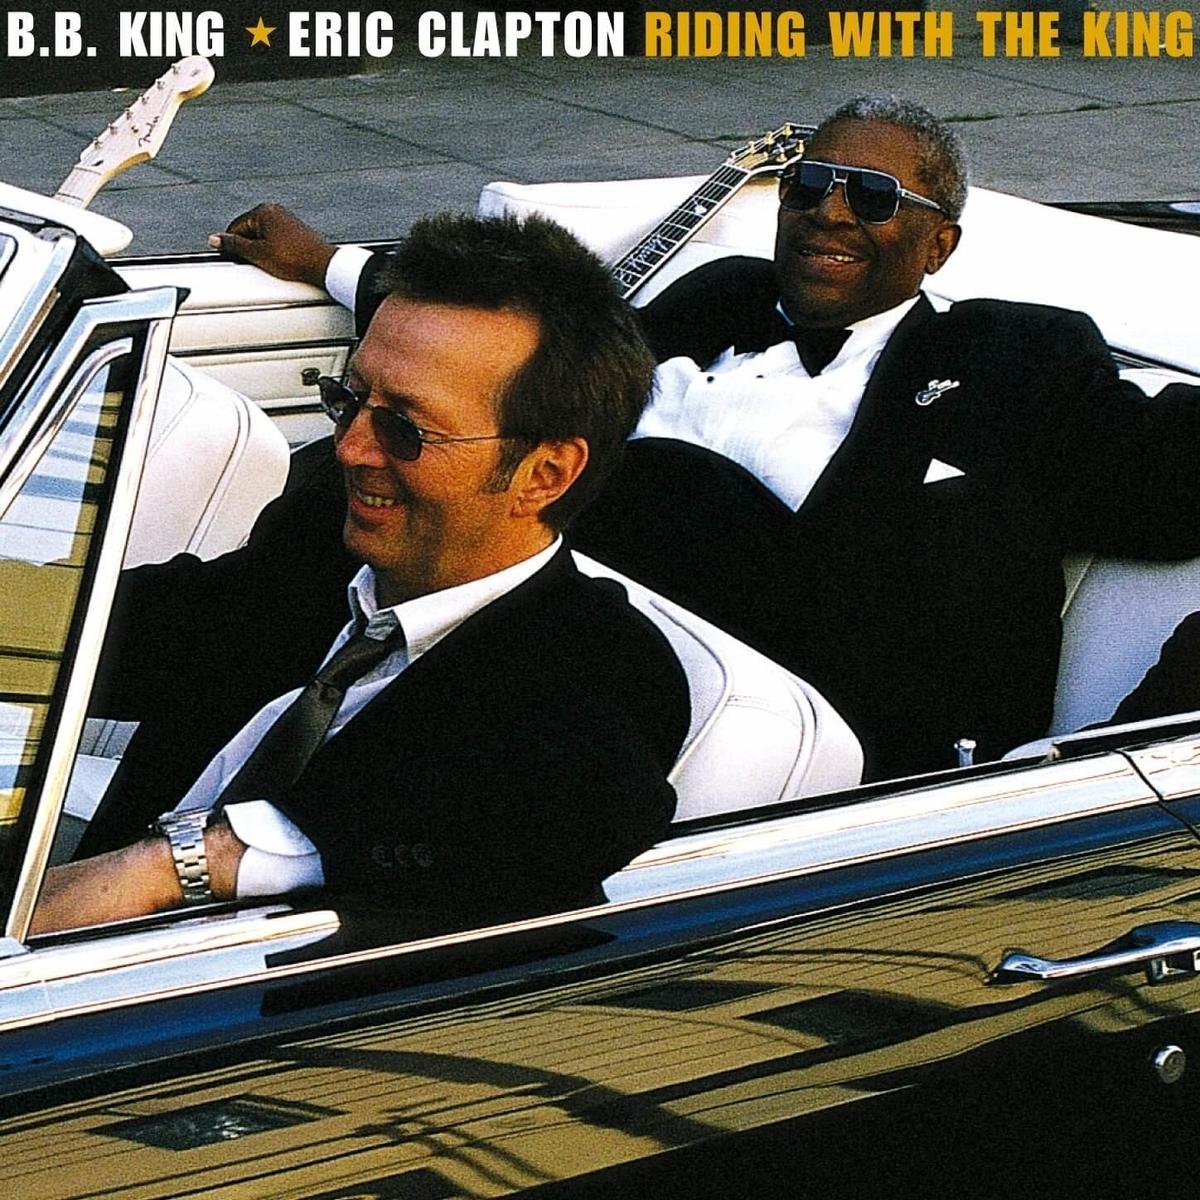 B.B.キング&エリック・クラプトン「ライディング・ウィズ・ザ・キング」のアルバムジャケ